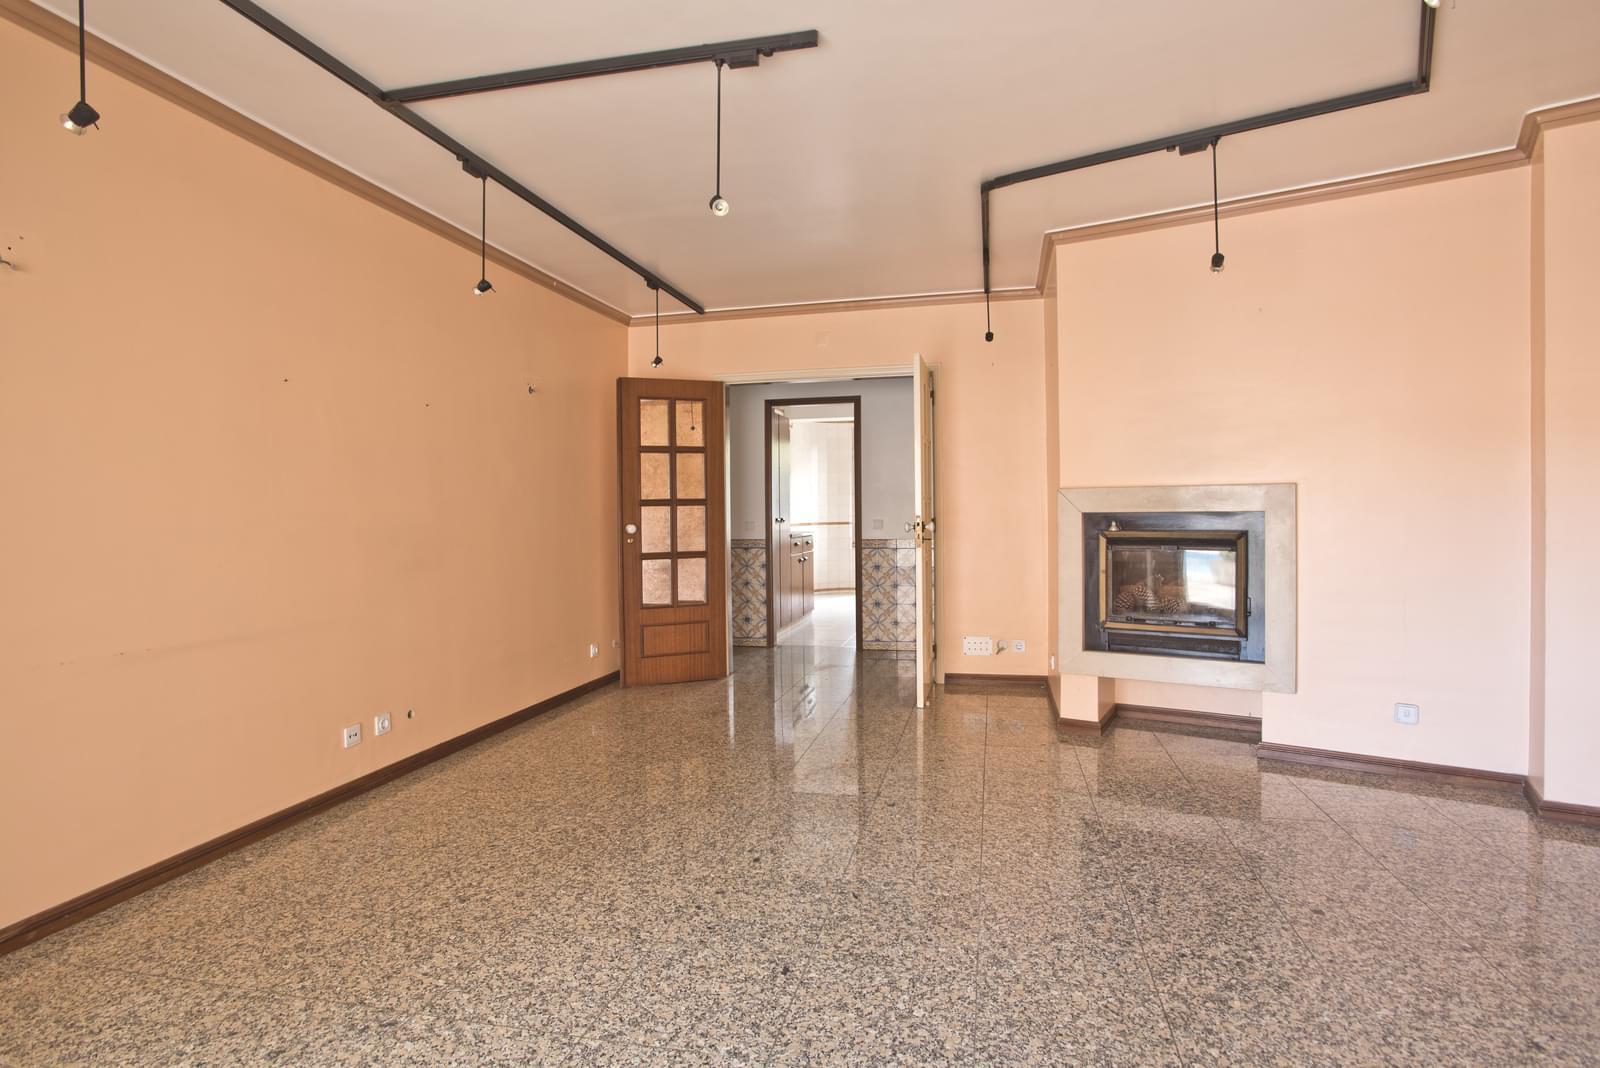 pf17280-apartamento-t2-cascais-a0b1c2eb-a0b6-43e6-ac33-8c7b62abe354